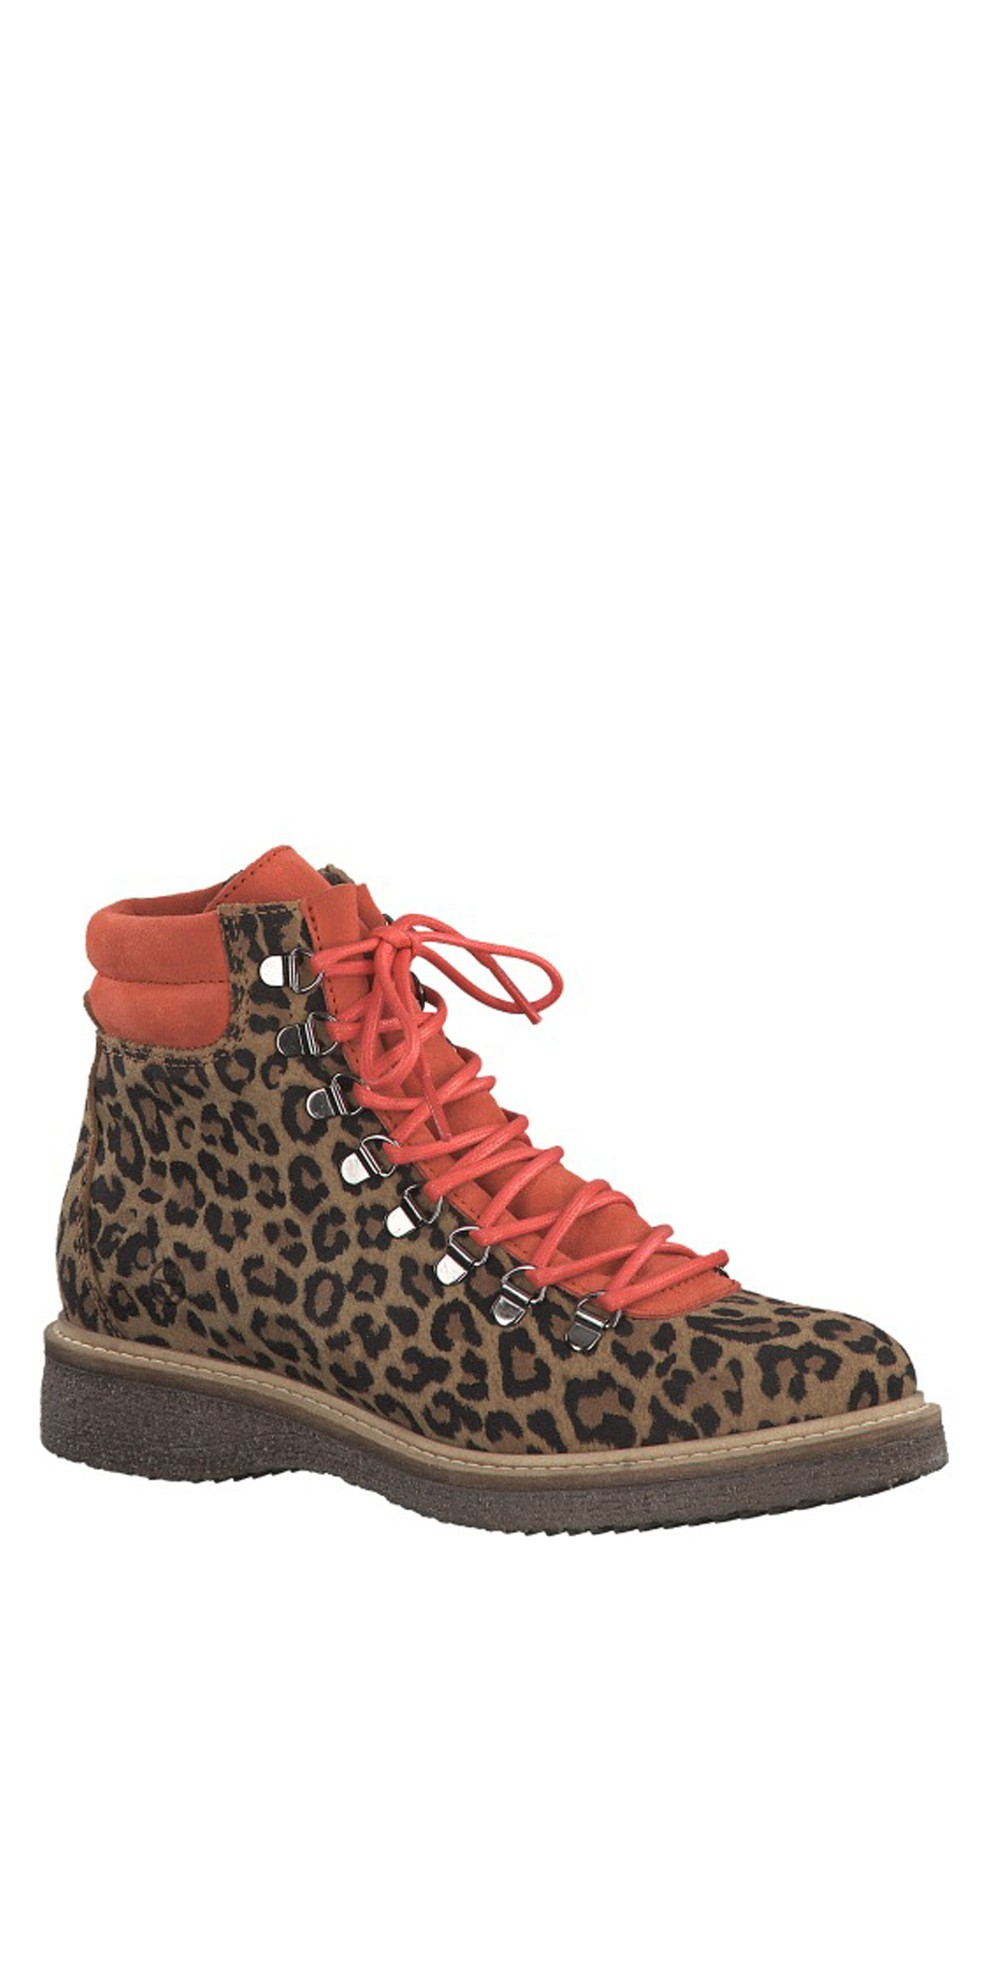 Castanha Leo Print Leather Hiker Boot main image